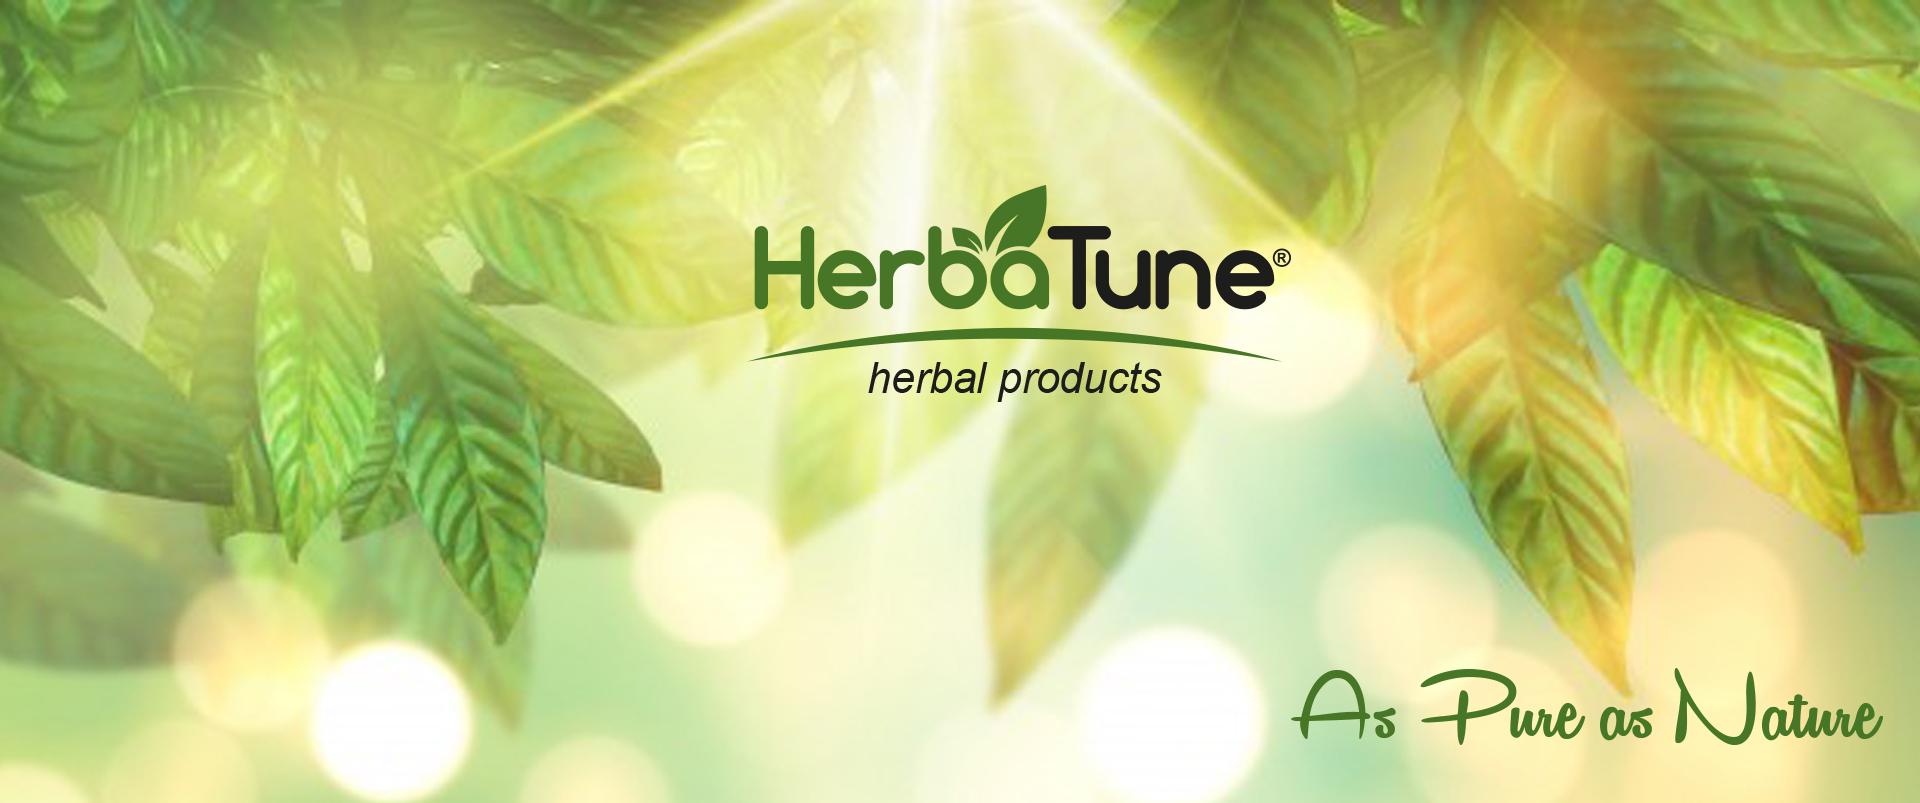 herbatune- هرباتیون